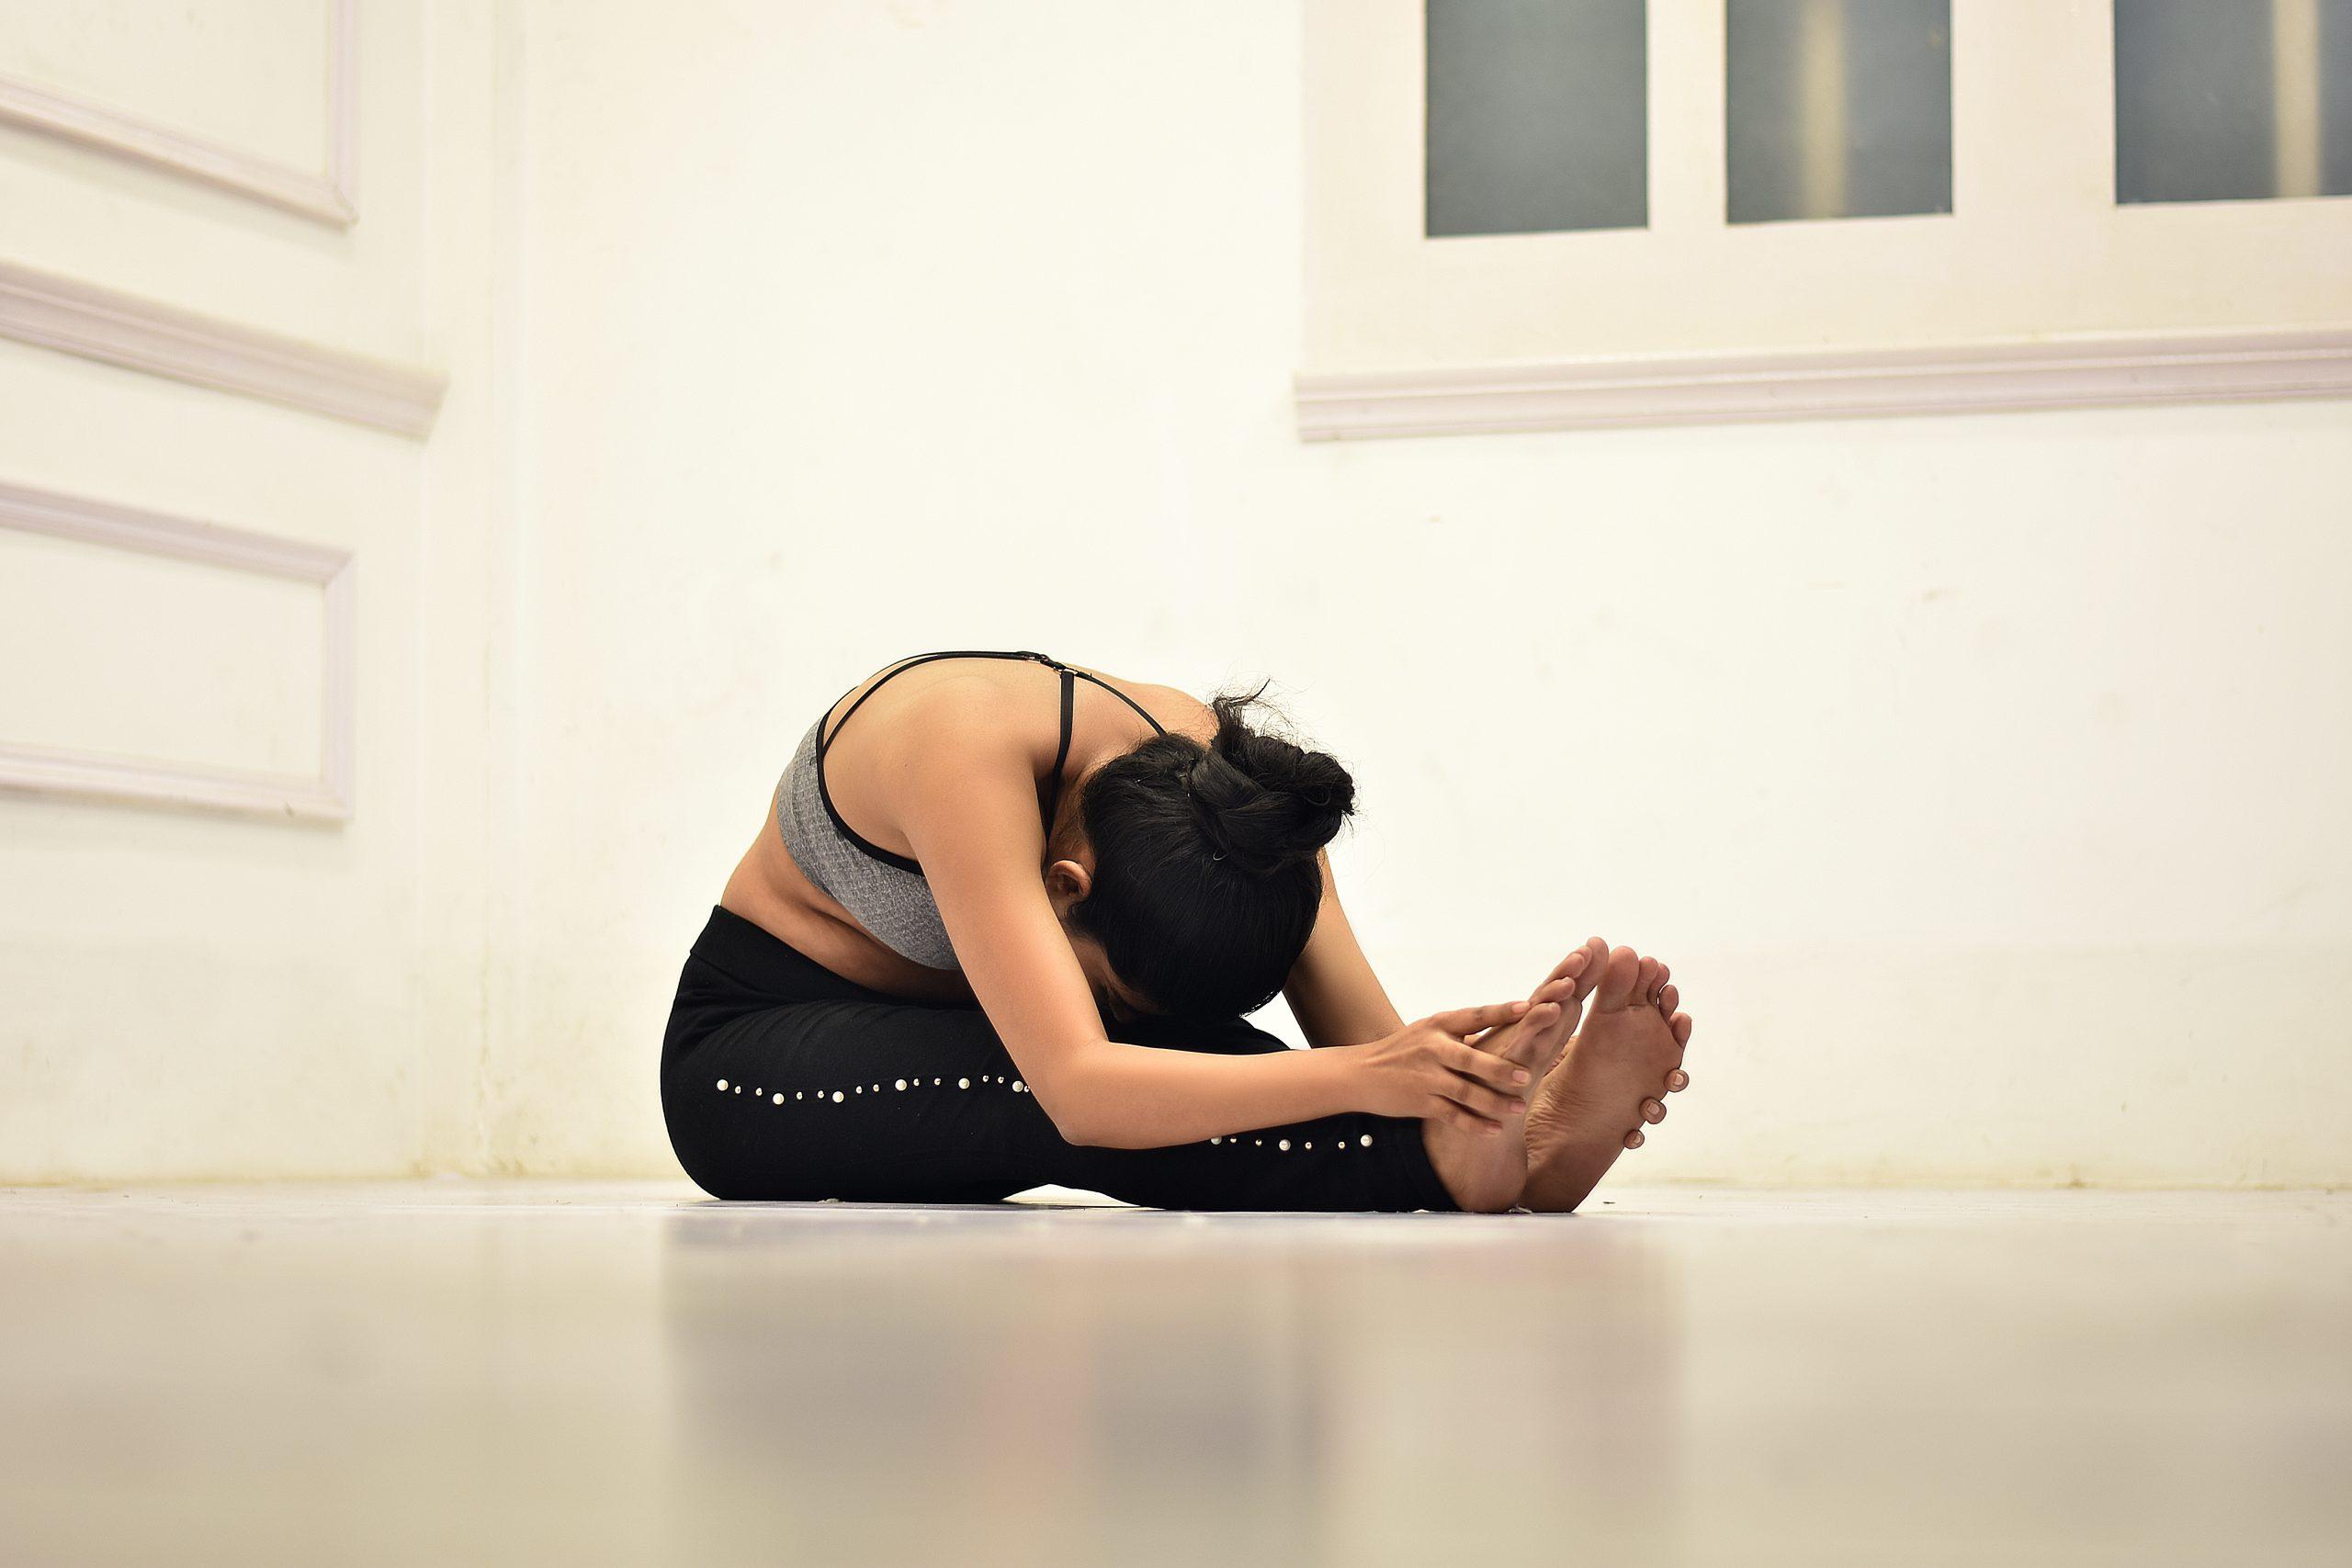 Yoga Seated Forward Bend - Paschimottanasana